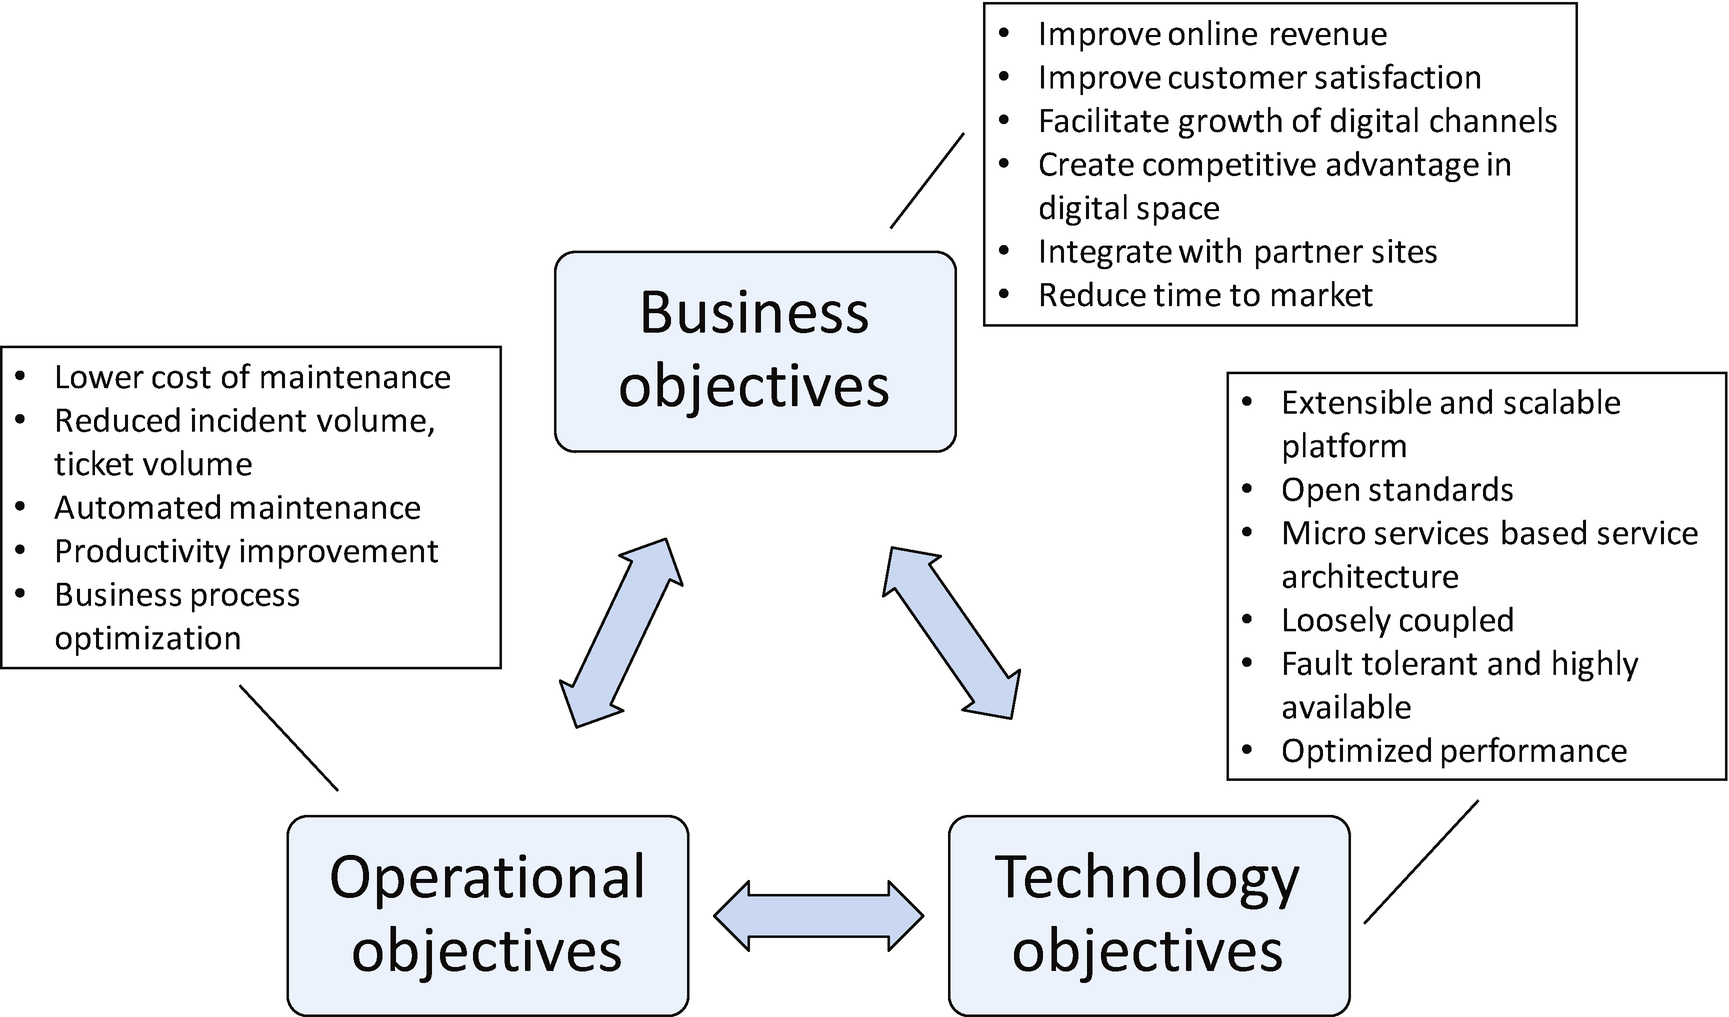 Introduction to Digital Experience Platforms | SpringerLink